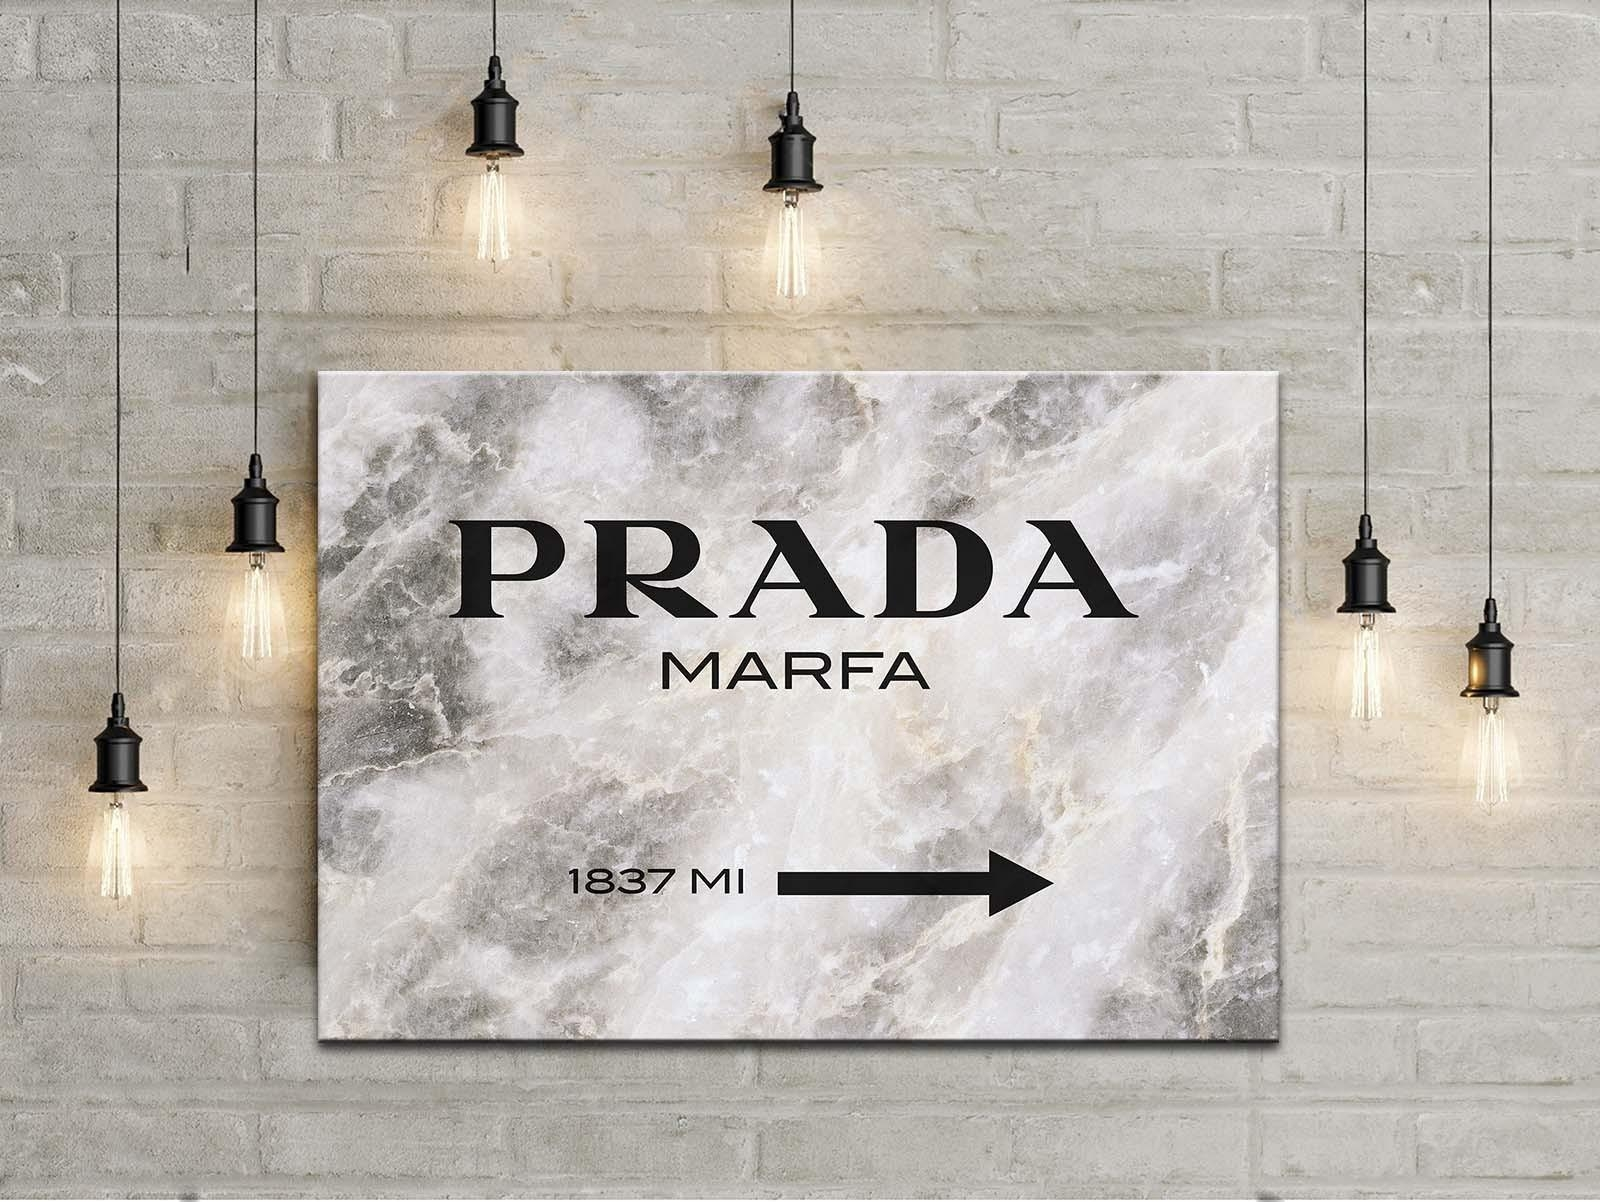 Prada Marfa Gossip Girl Sign, Painting Canvas Art, Wall Art, Home Regarding Prada Wall Art (View 10 of 20)